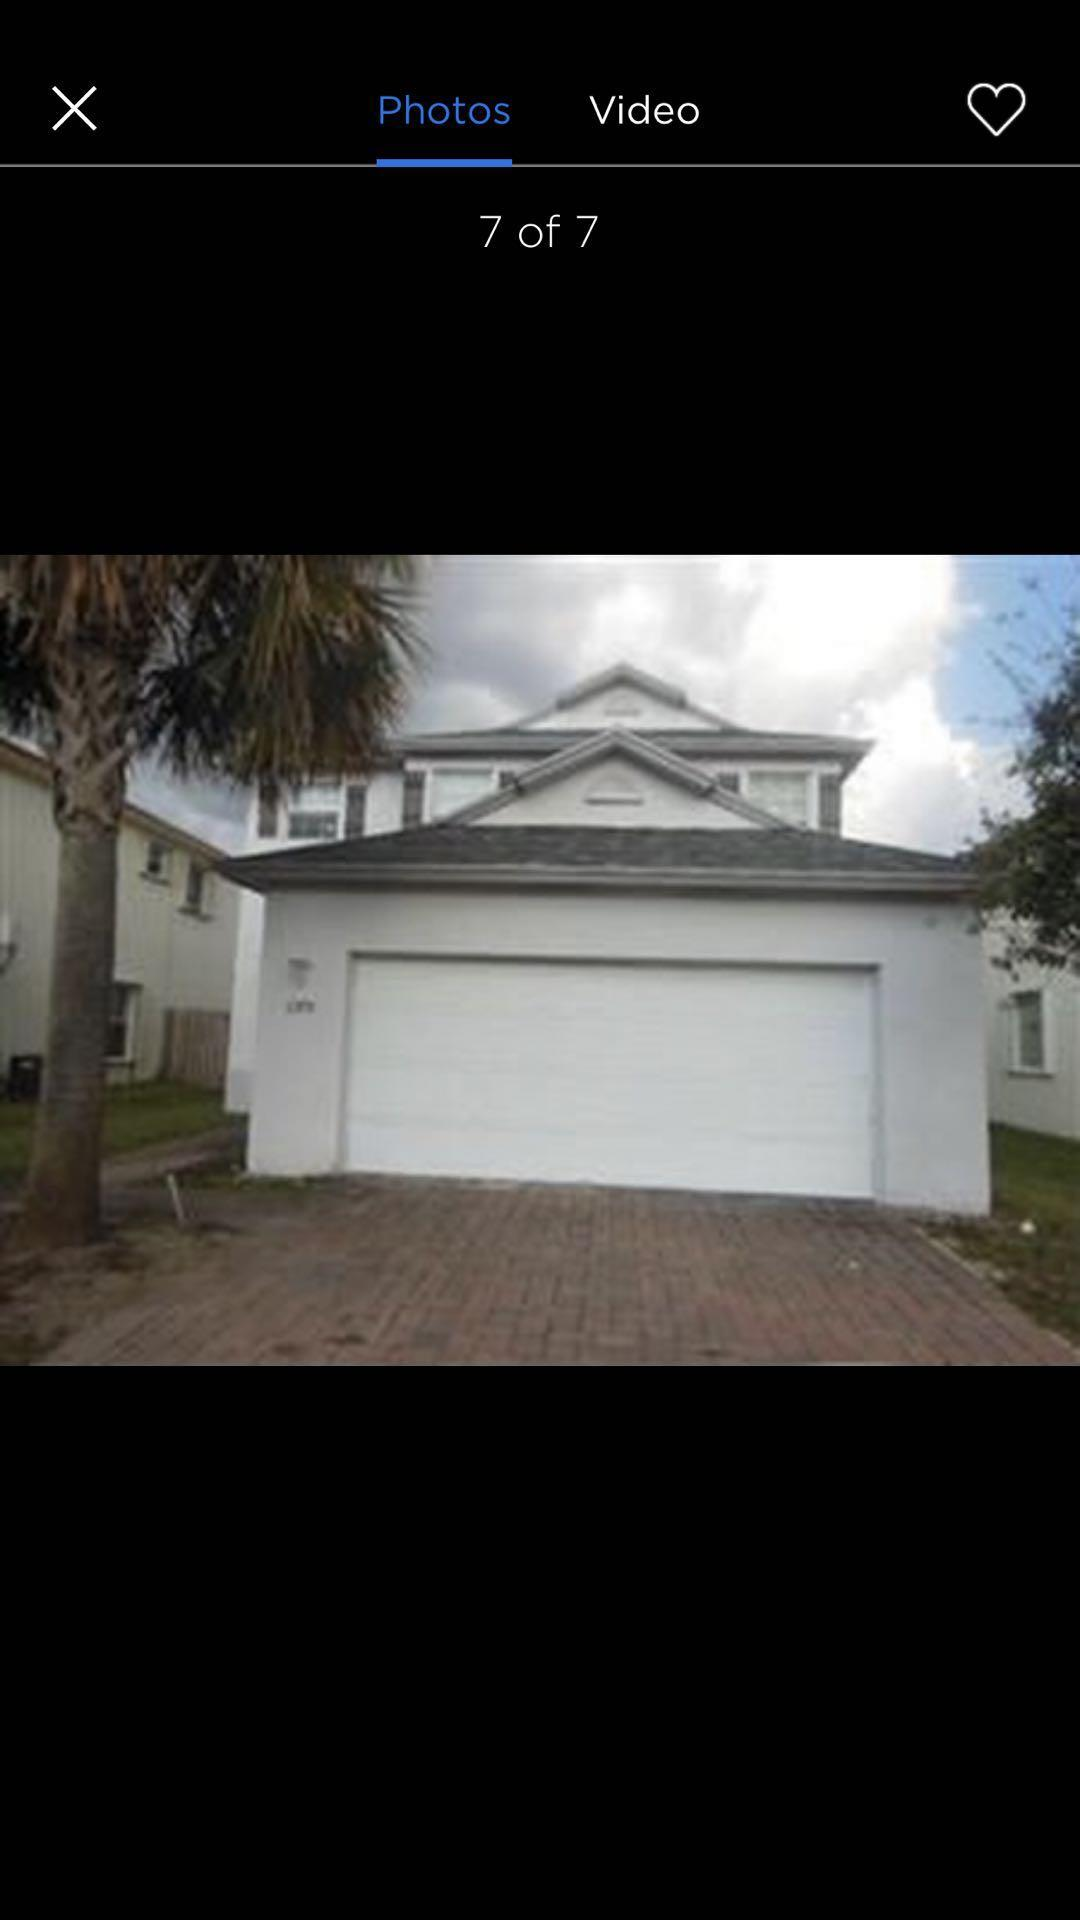 1170 Winding Rose Way, West Palm Beach, FL 33415